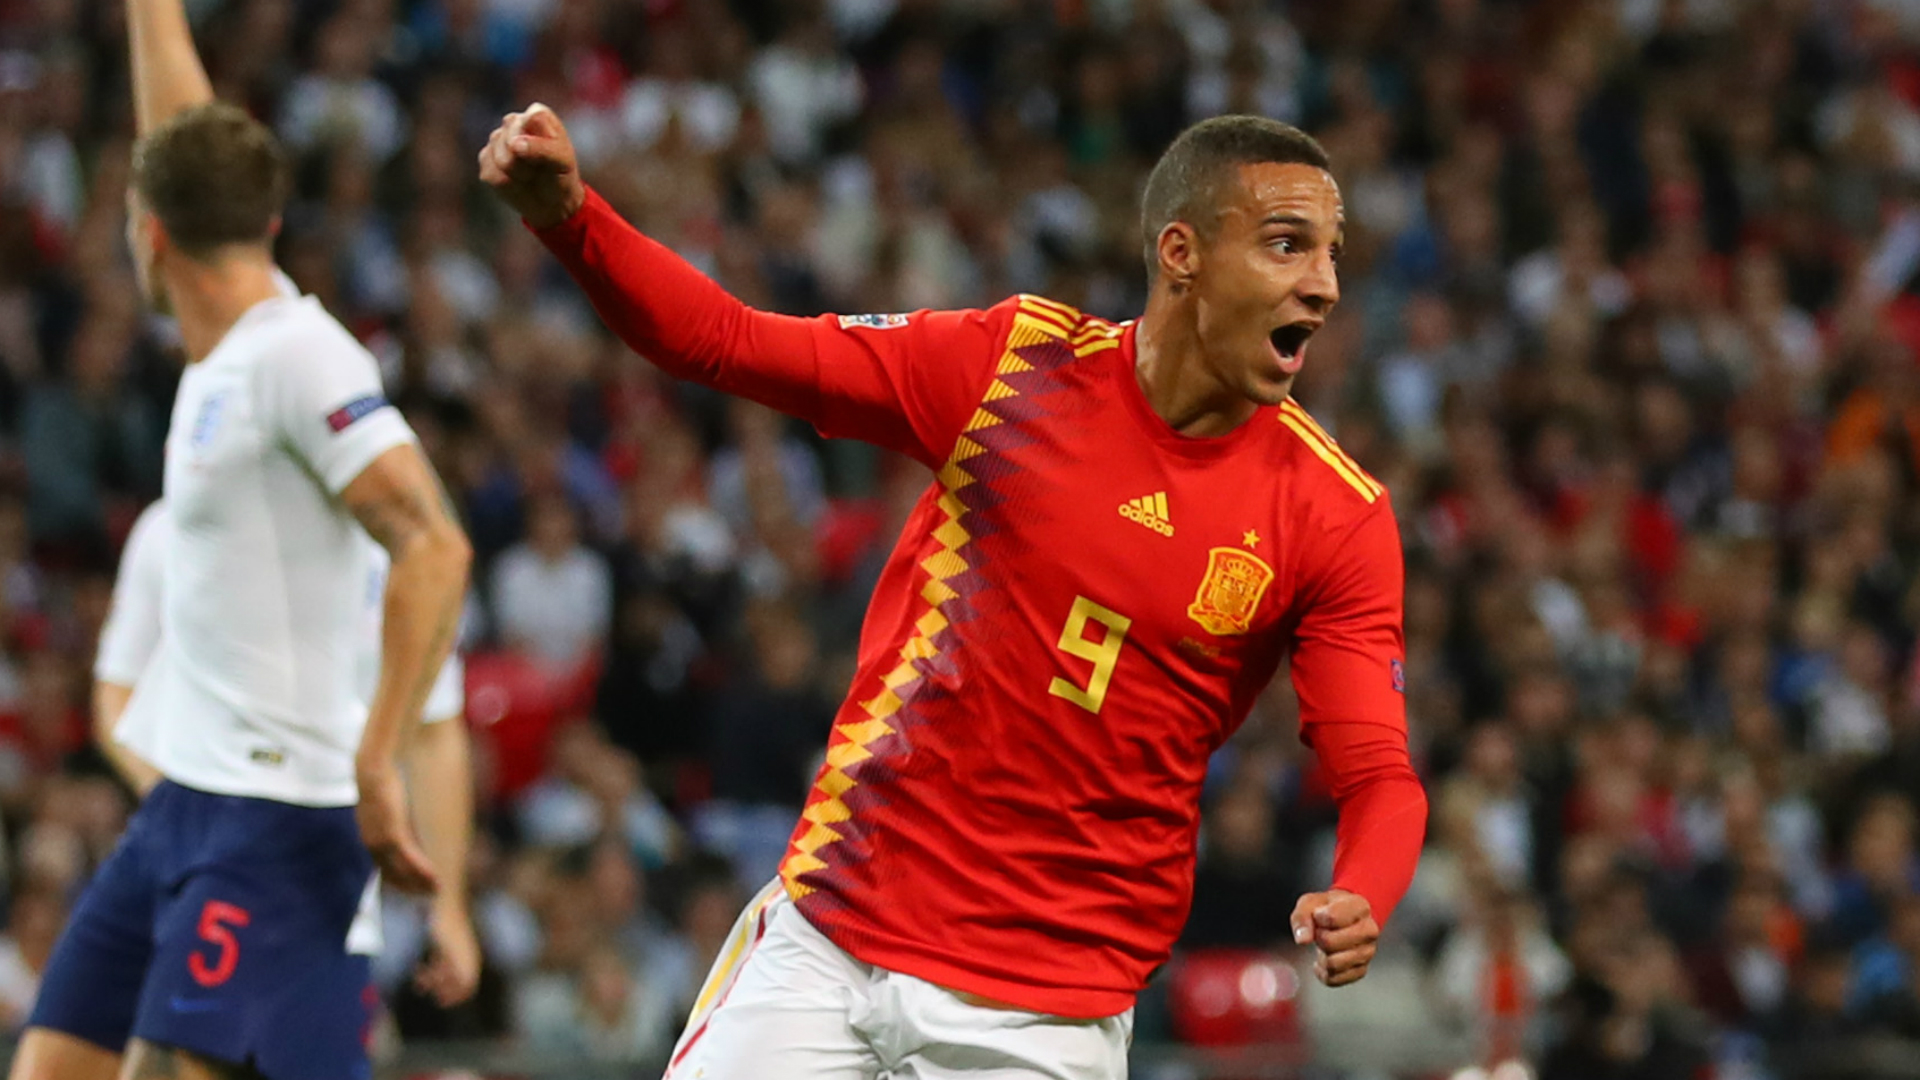 Sweden 1-1 Spain: Rodrigo late show seals Euro 2020 qualification